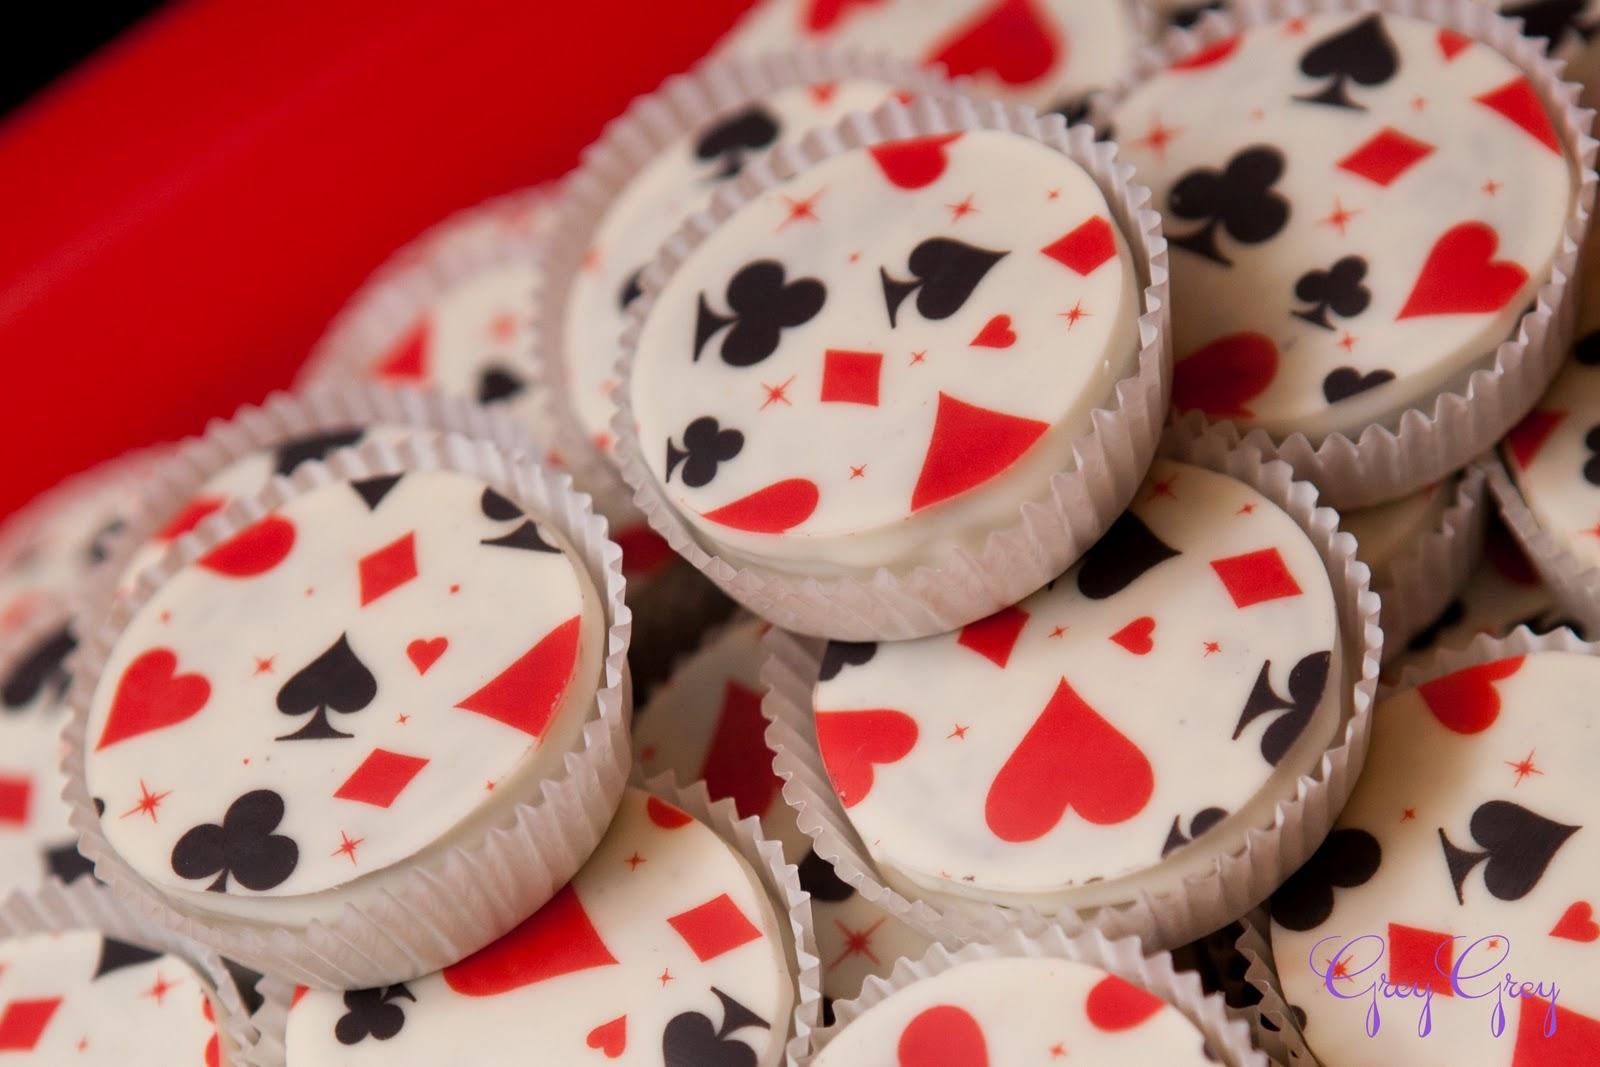 GreyGrey Designs Casino 40th Birthday Party